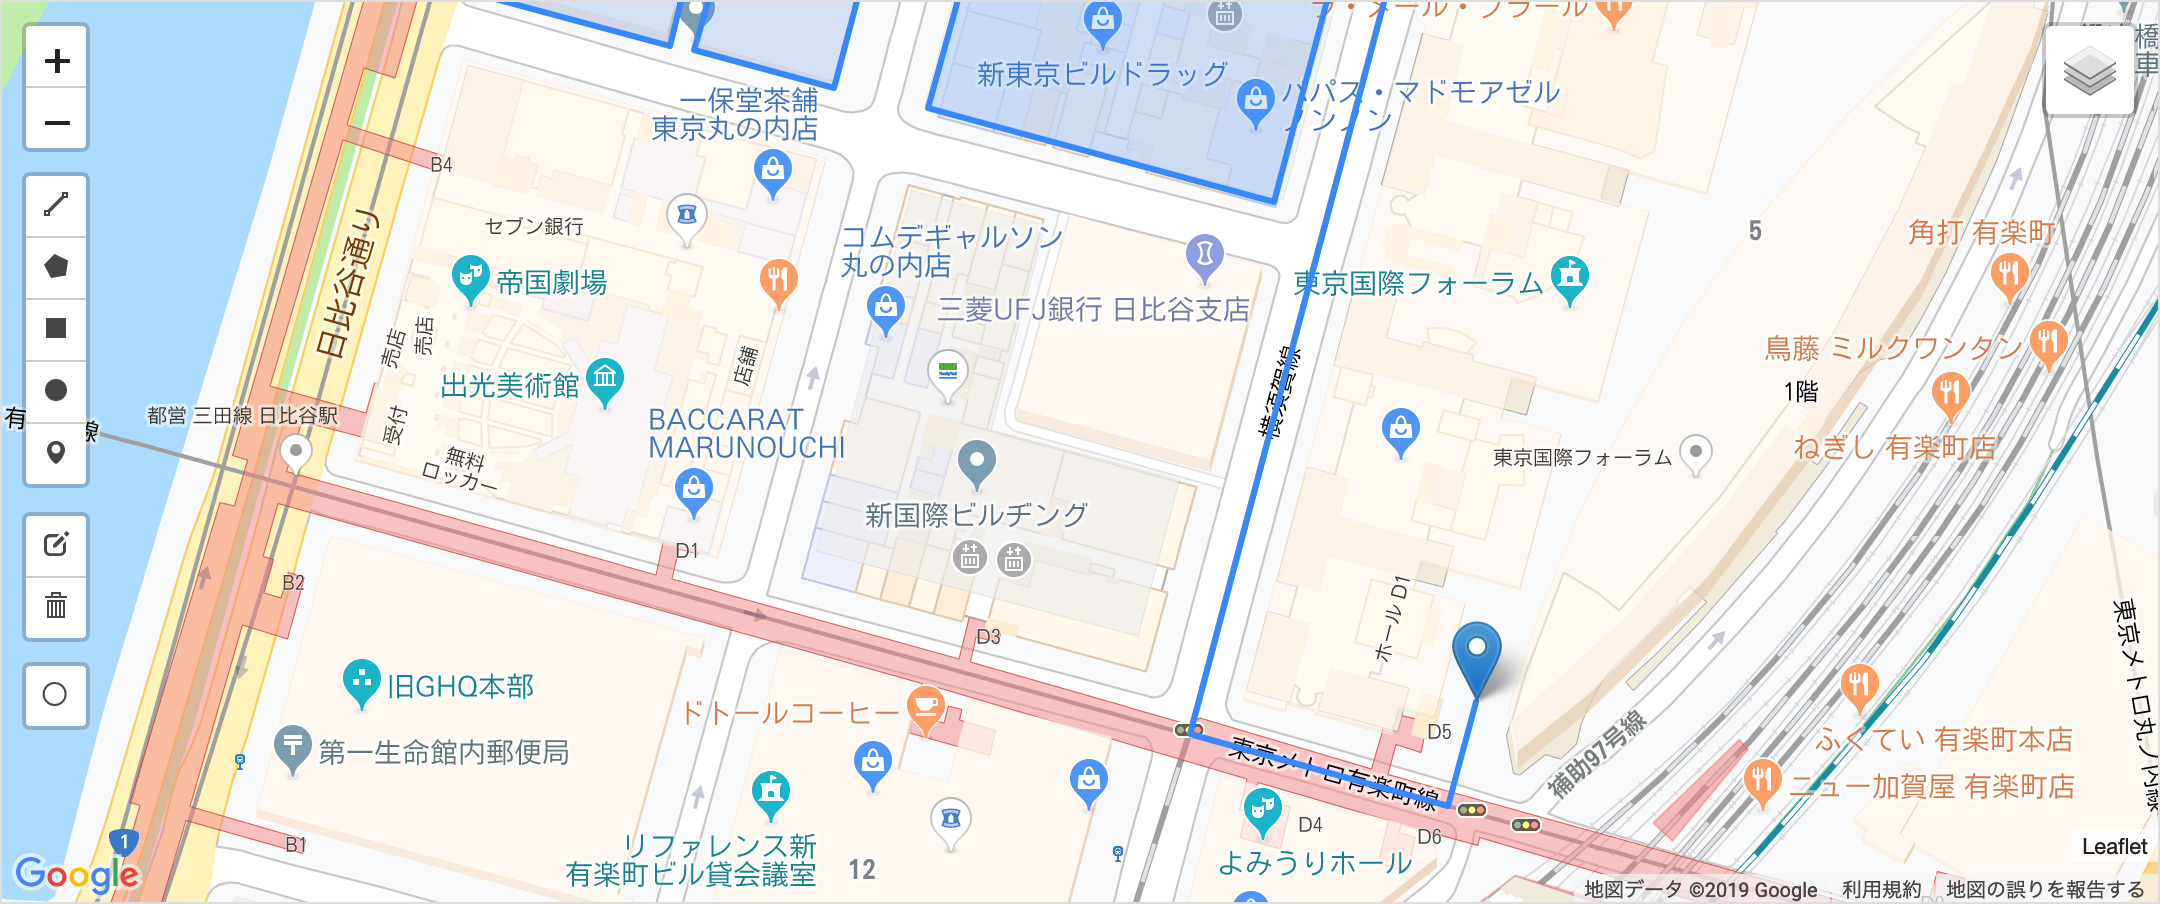 GIS(地理情報システム)のデモ